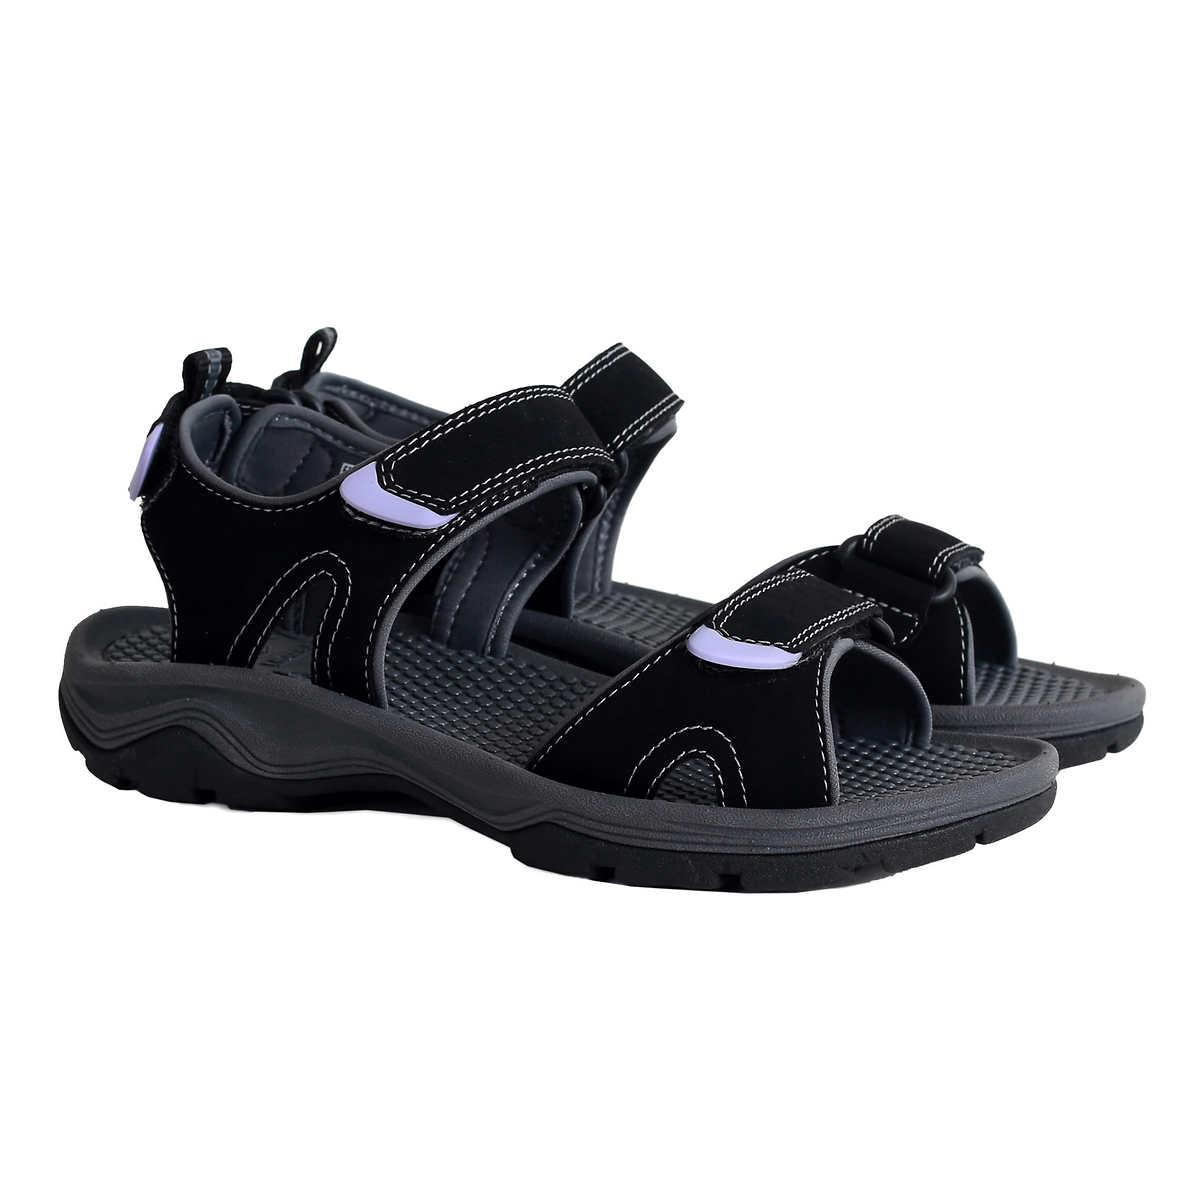 Womens river sandals - Khombu Ladies River Sandal Click To Zoom